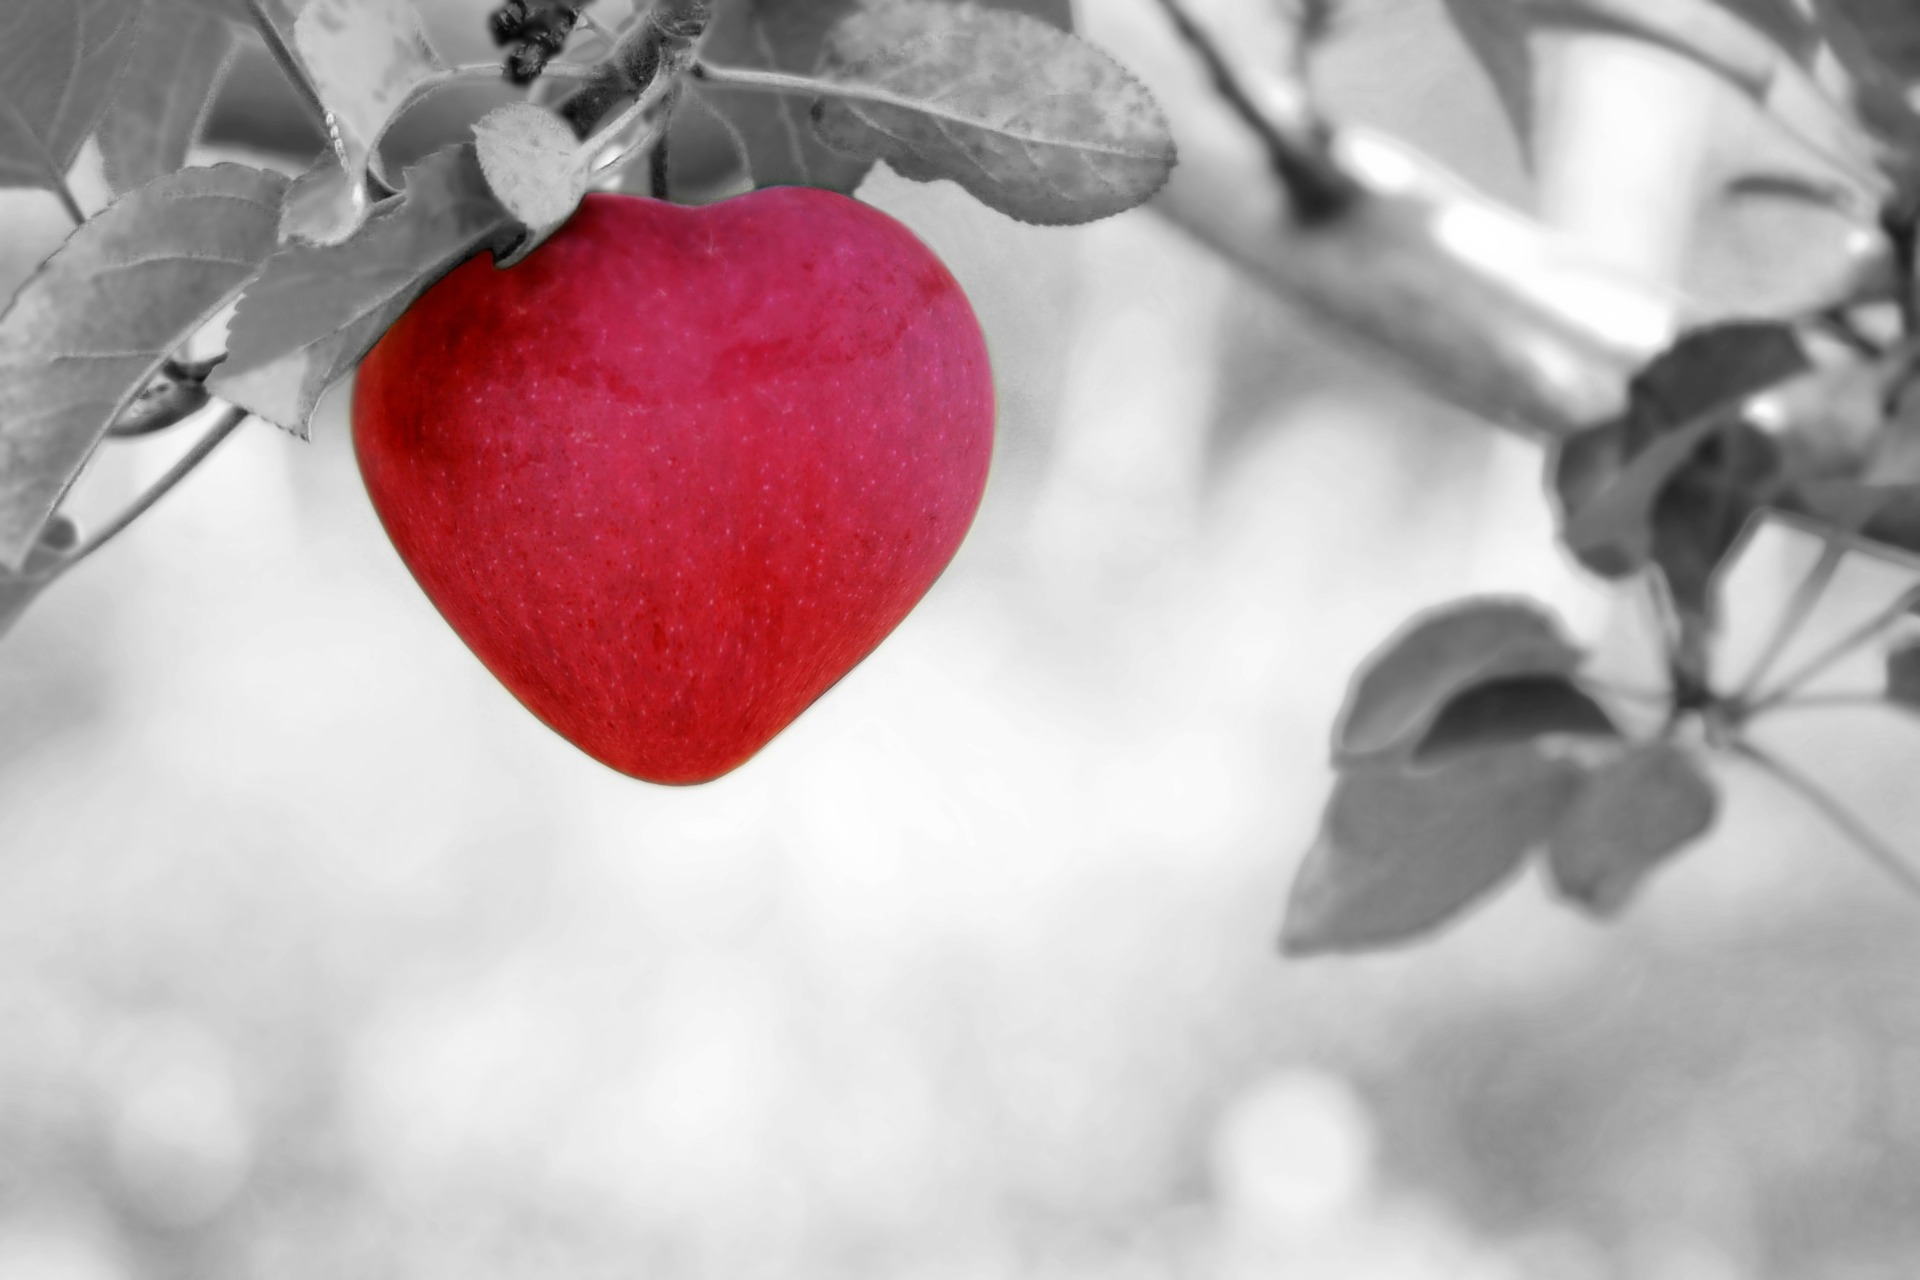 A heart shaped apple